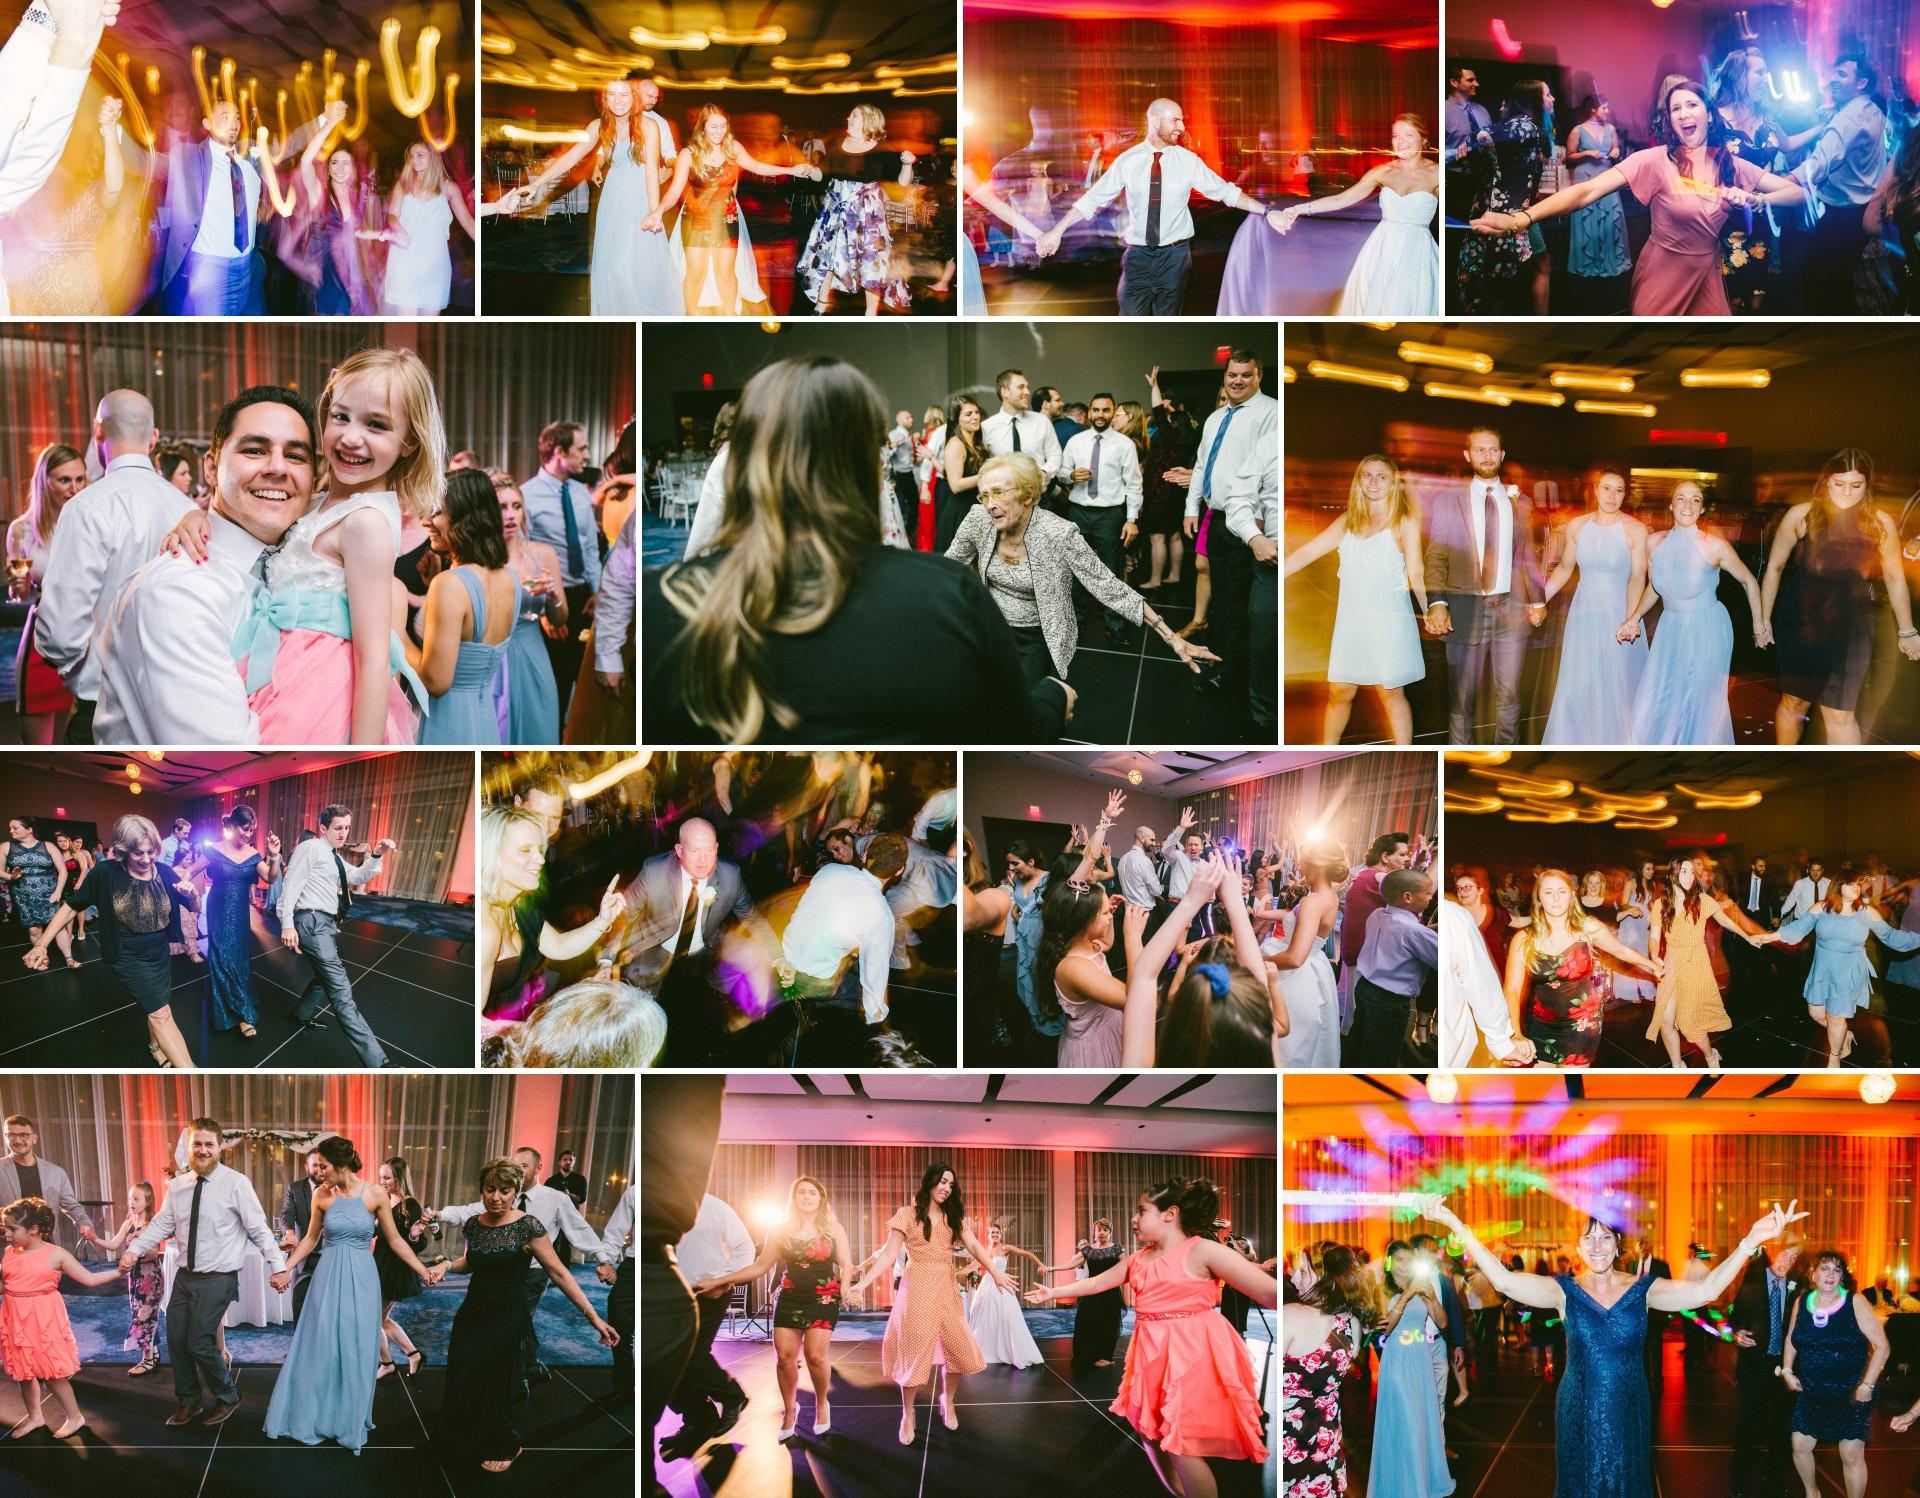 Dowtown Hilton Cleveland Wedding Photographer 2 37.jpg